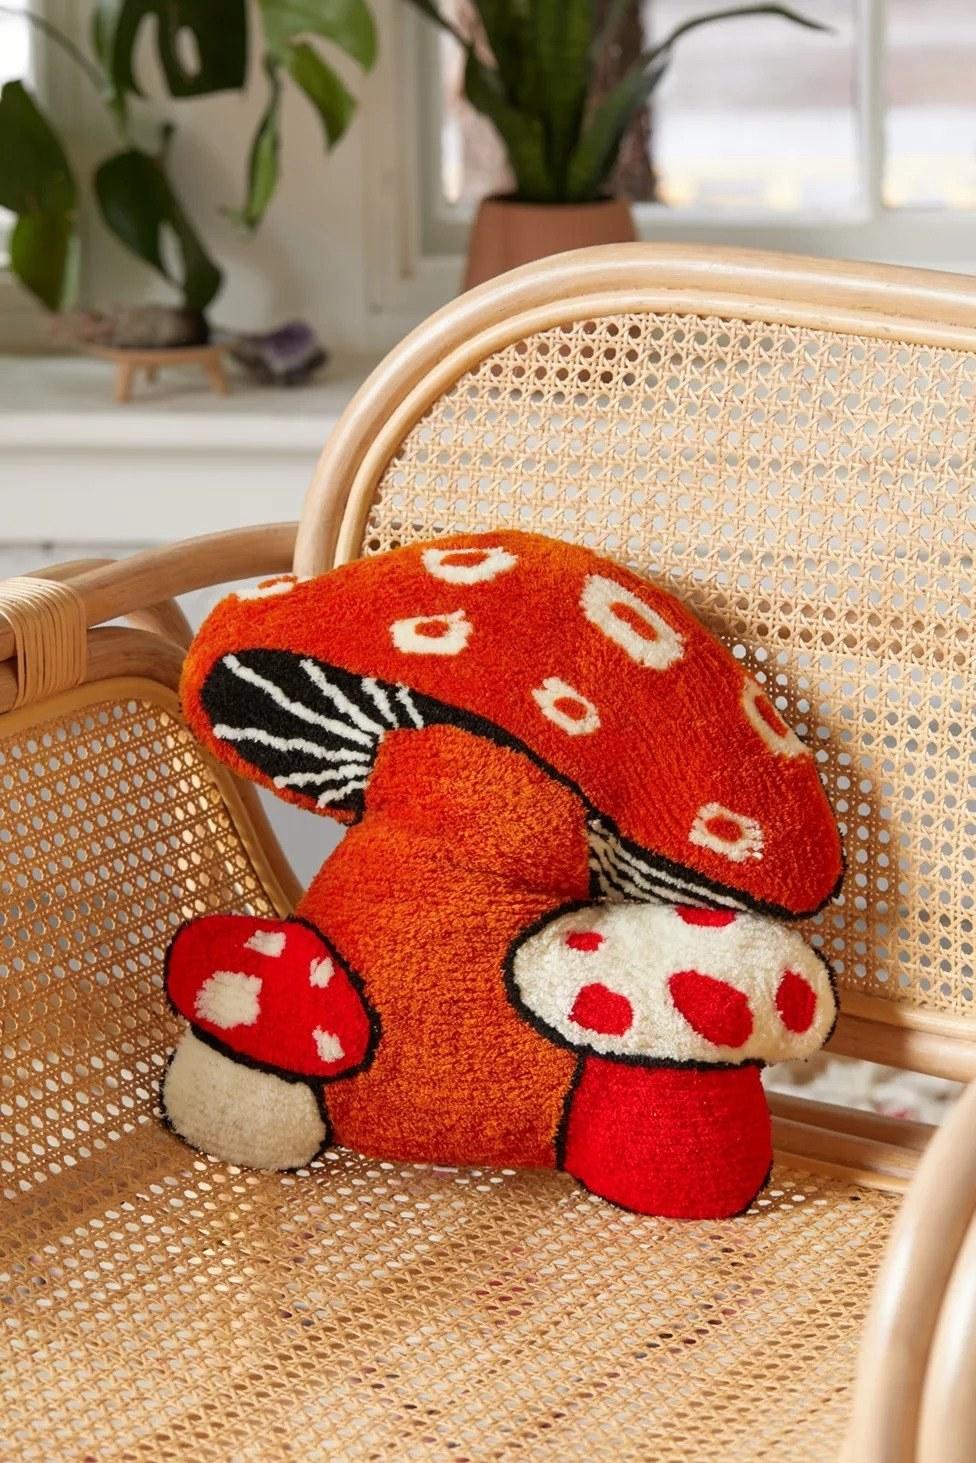 pillow shaped like three mushrooms